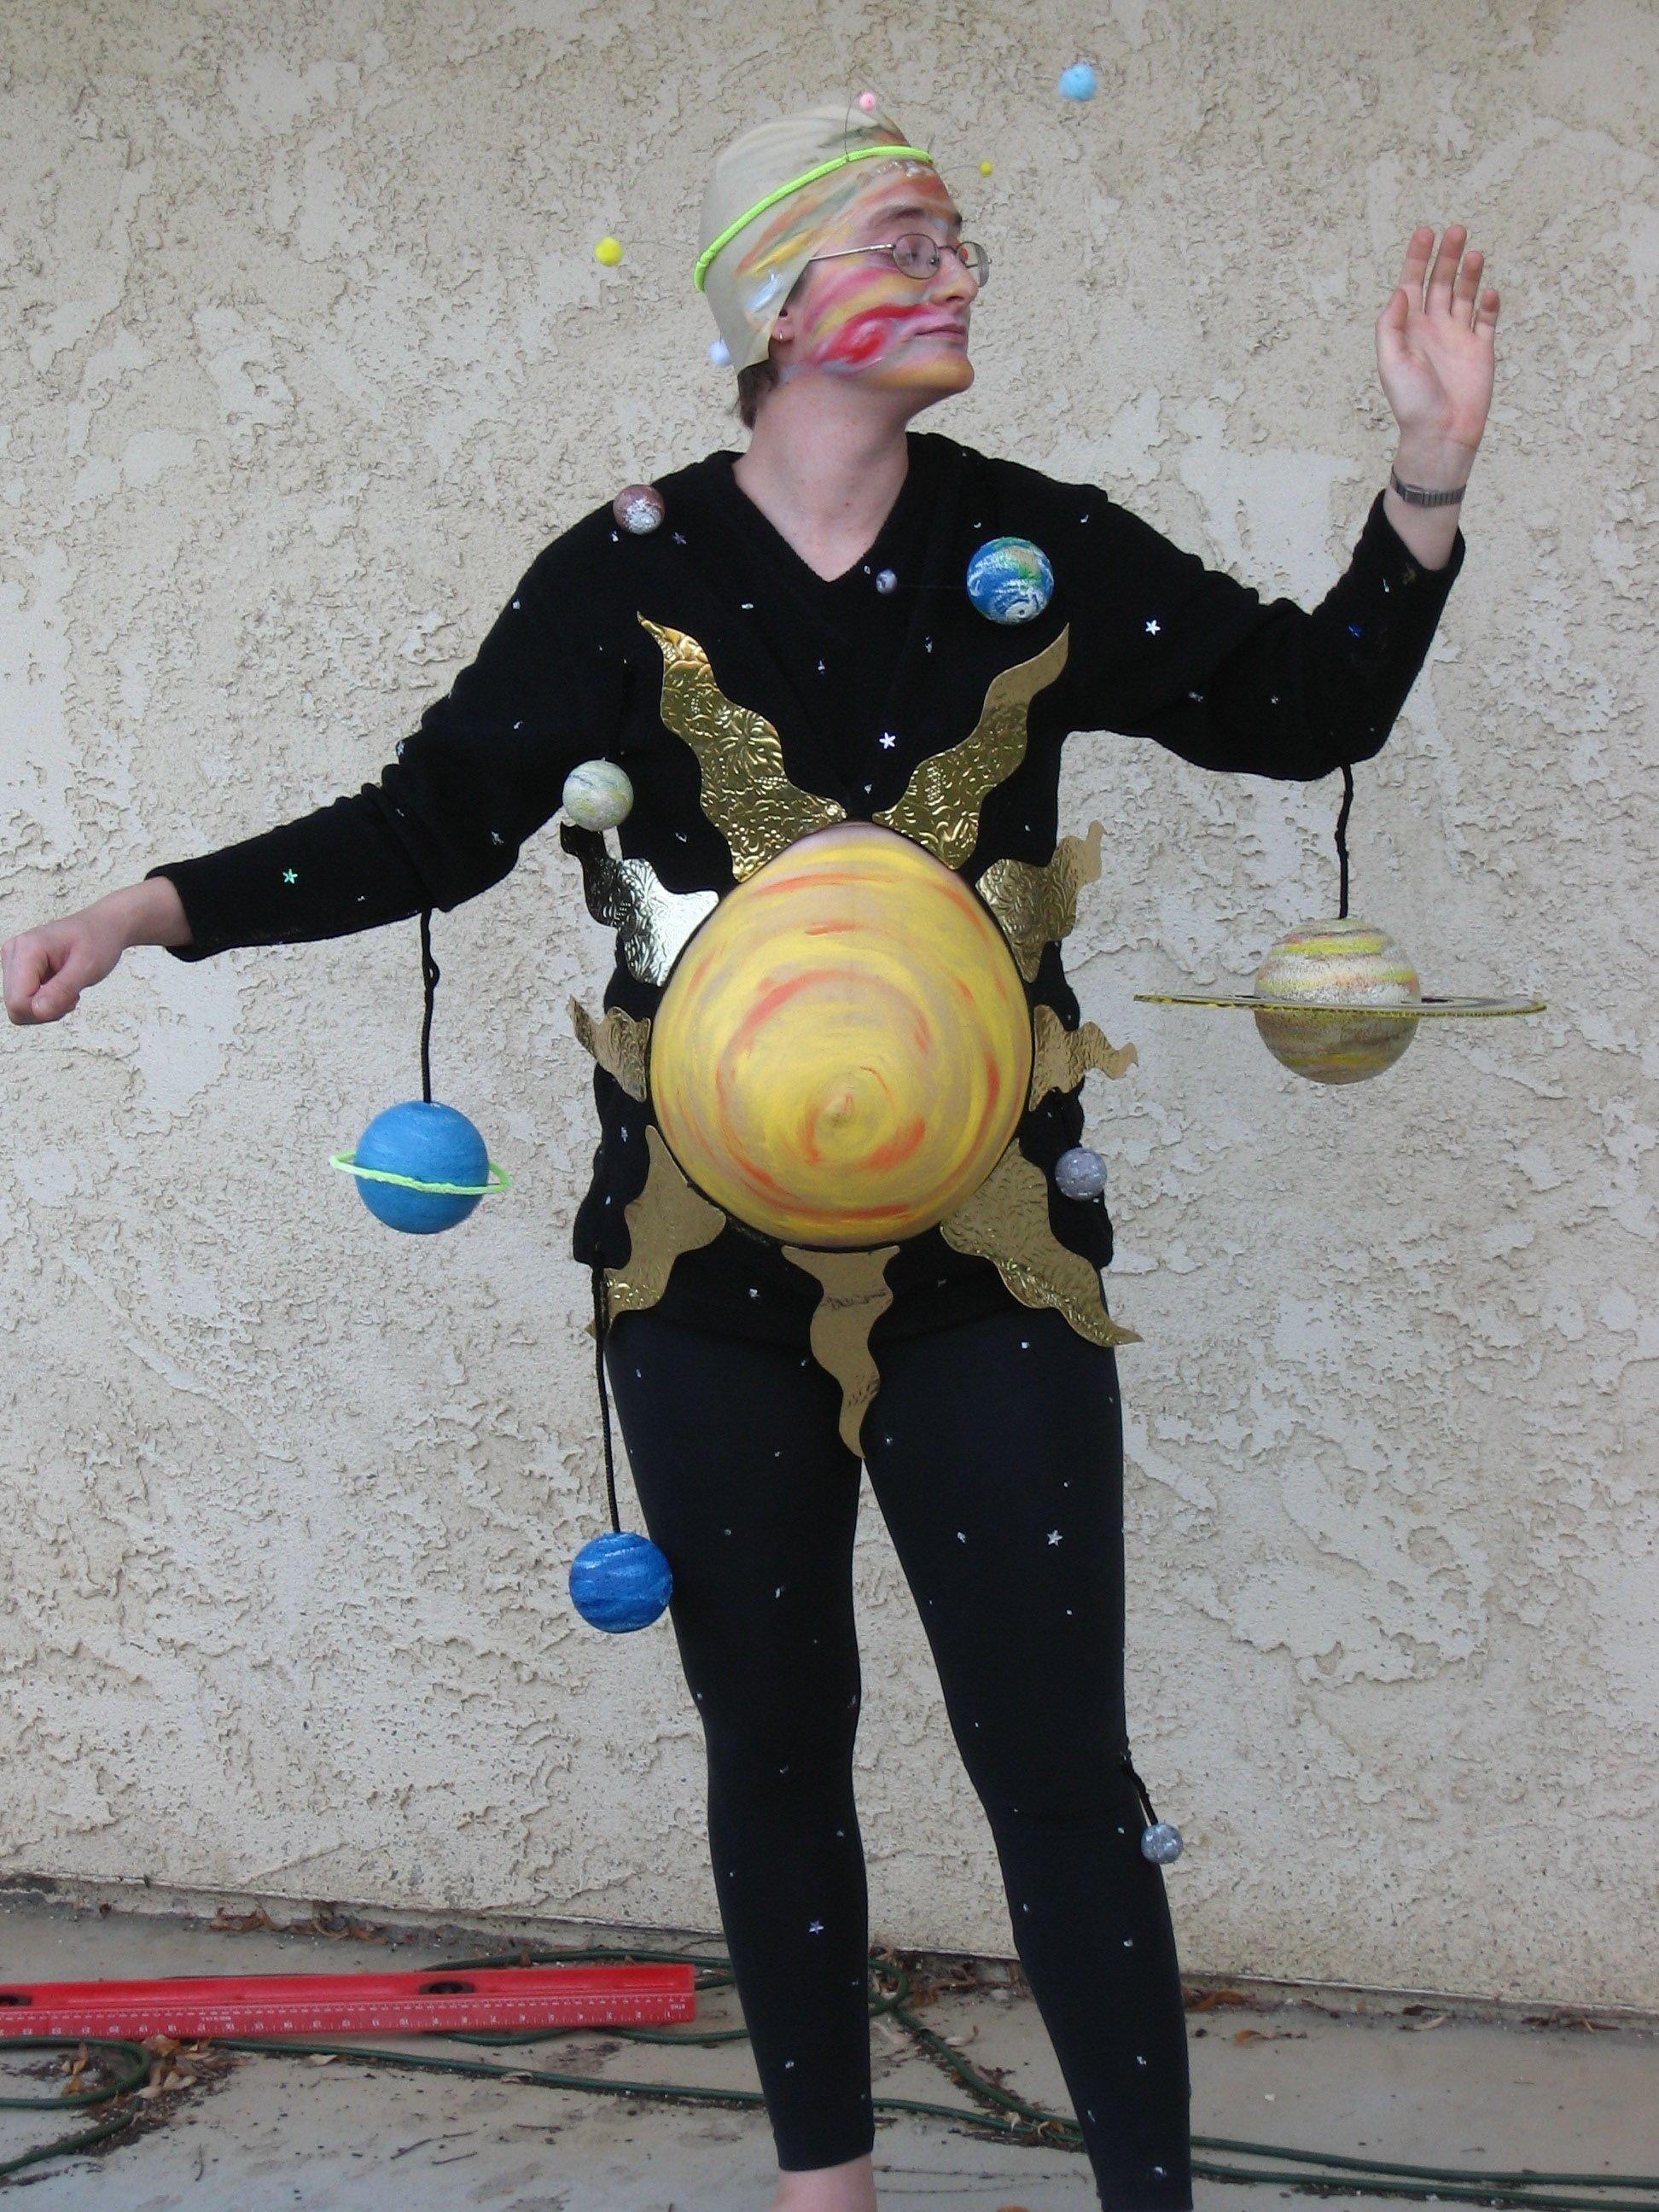 10 Fabulous Funny Pregnant Halloween Costume Ideas 25 pregnancy halloween costume ideas halloween costumes costumes 2020